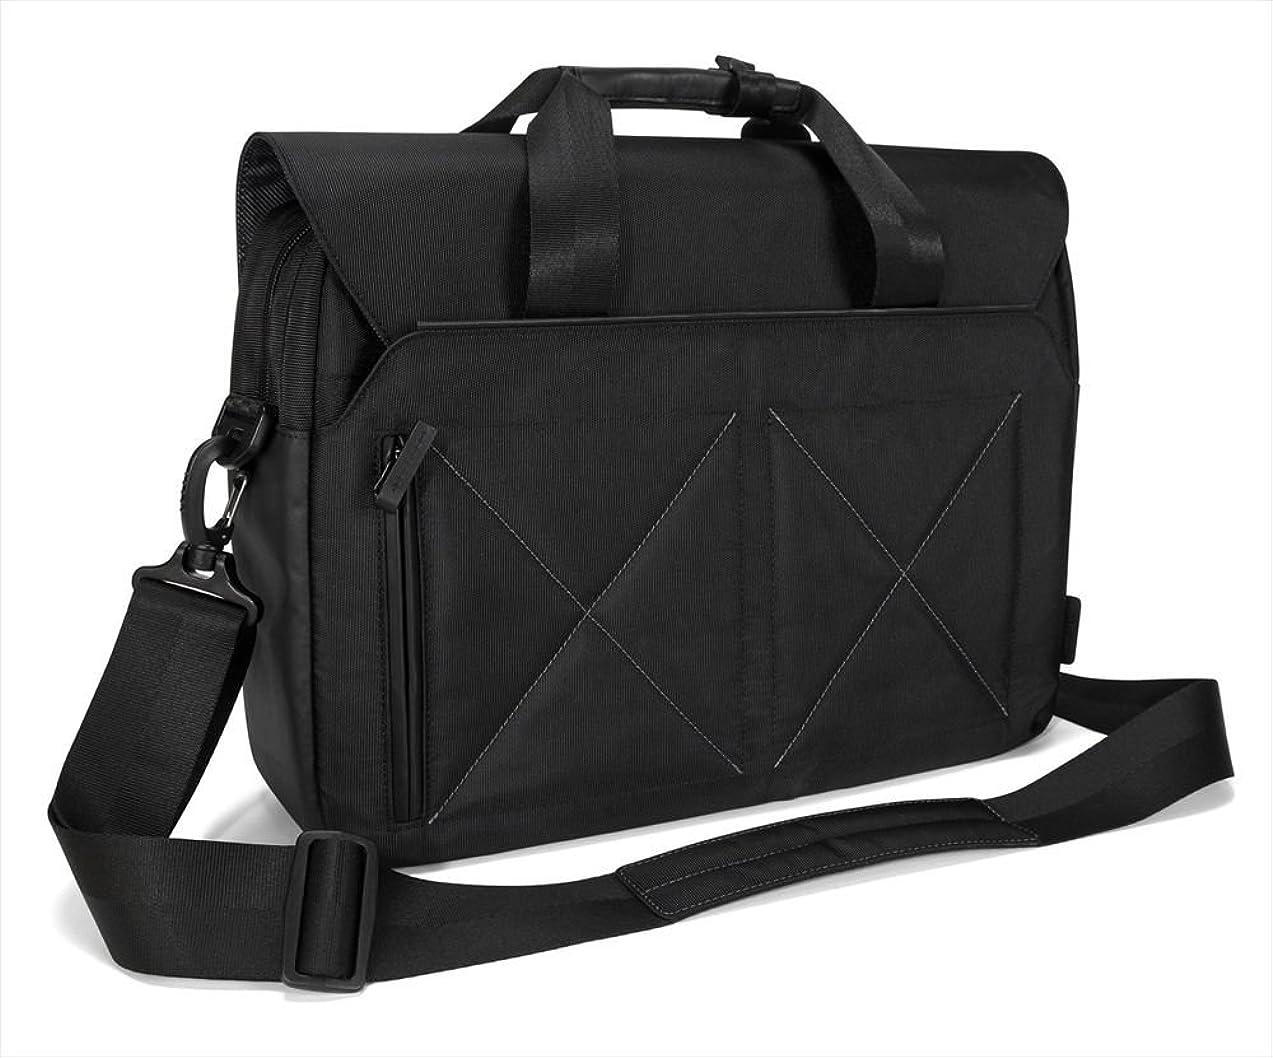 Targus T-1211 Topload Case for 15.6-Inch Laptops, Black (TBT253)